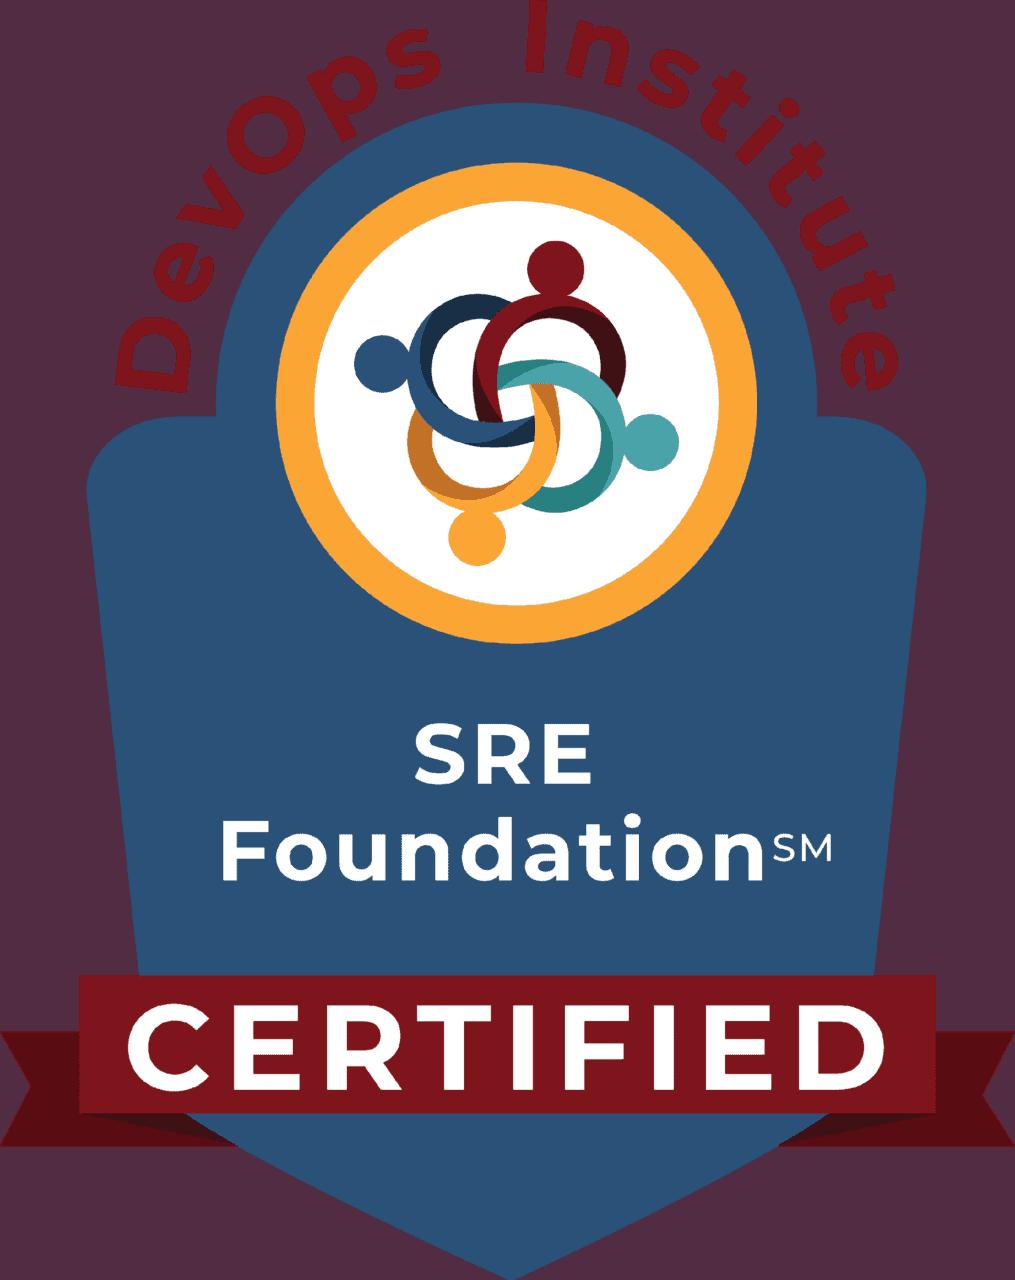 Abbildung 5: Site Reliability Engineering SRE Foundation Zertifikat